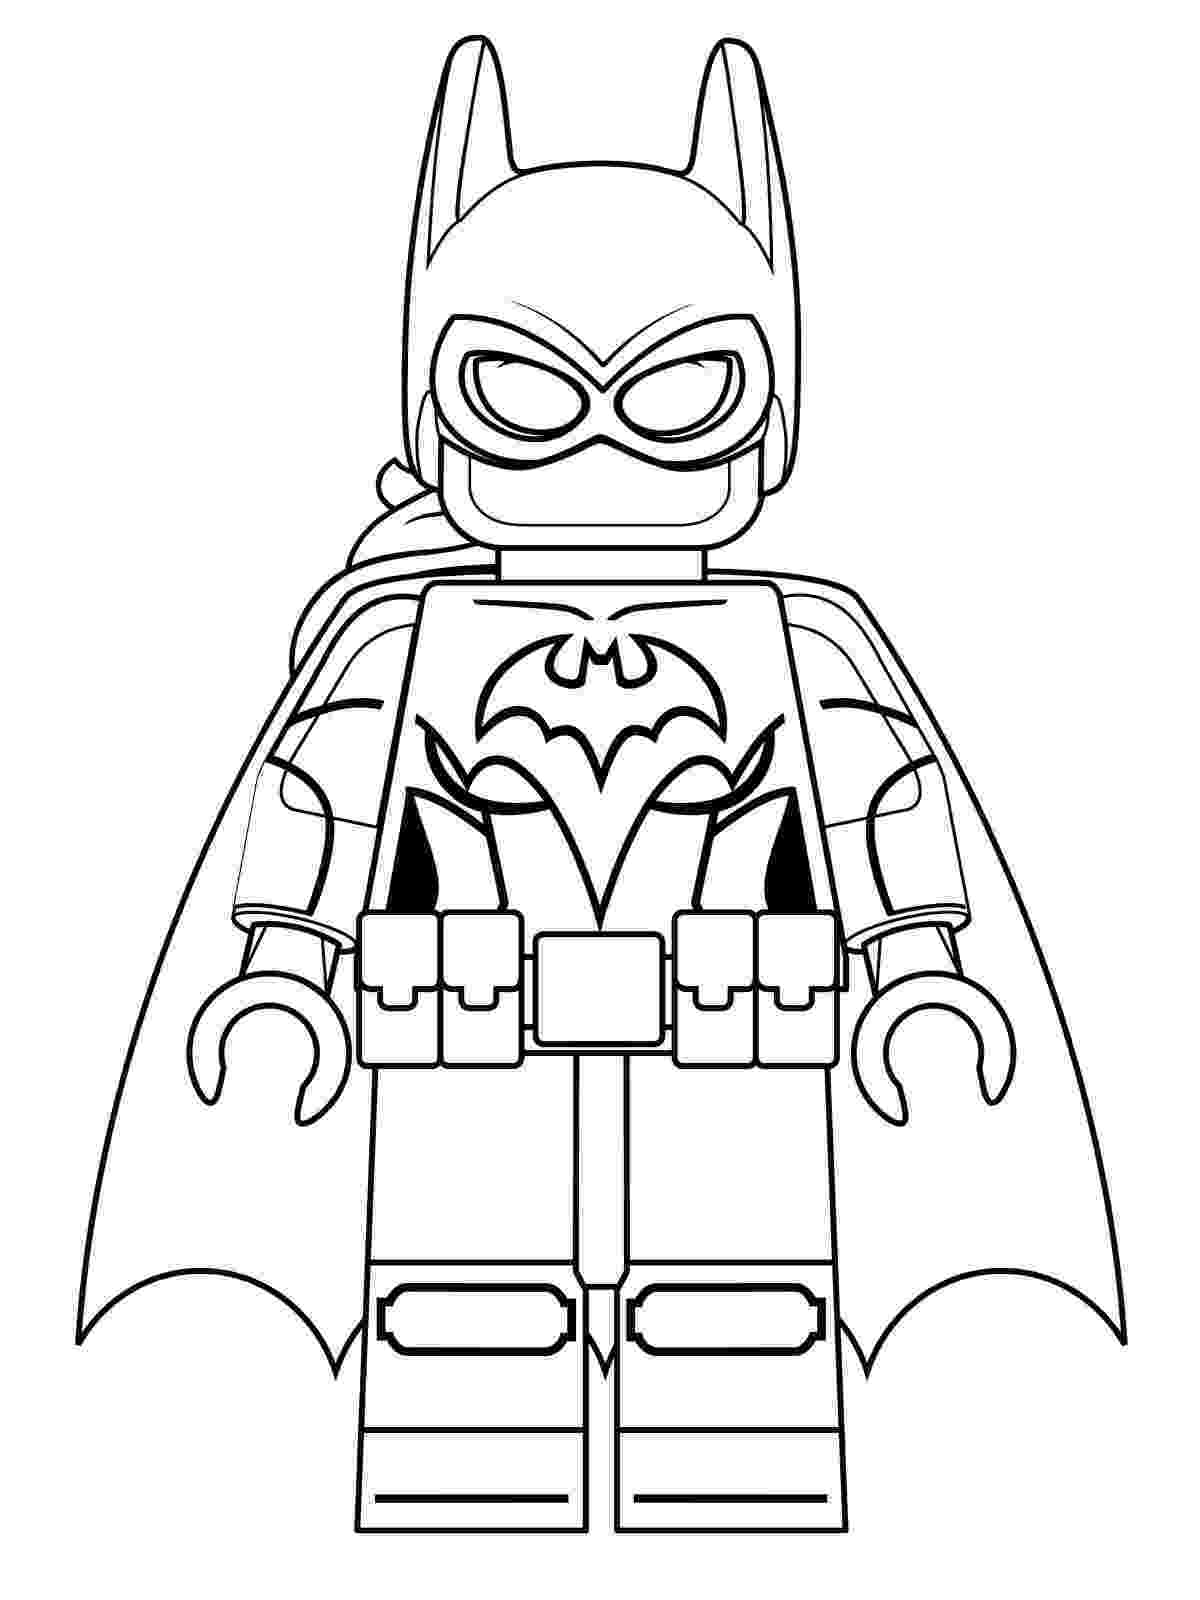 batman coloring lego batman coloring pages best coloring pages for kids batman coloring 1 1